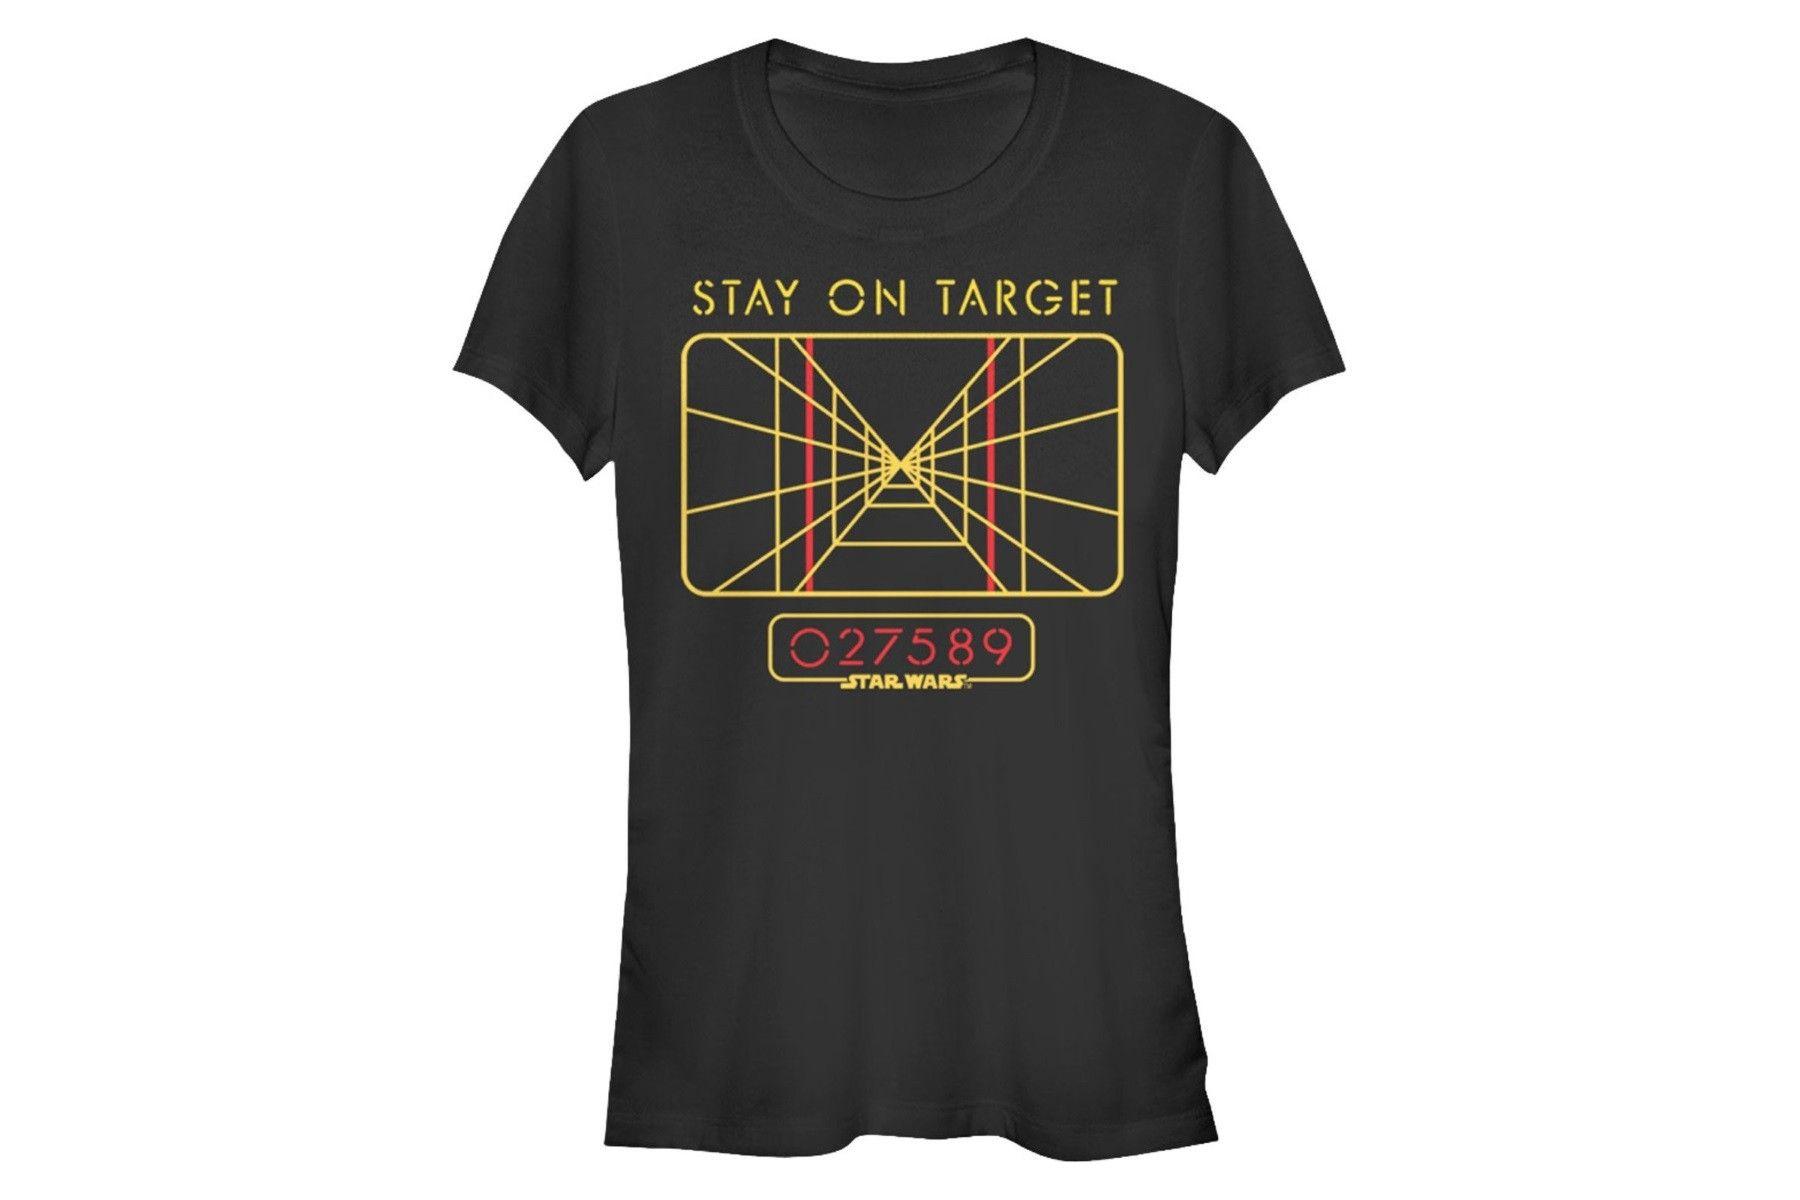 http://www.thekesselrunway.com/womens-stay-target-tee-80s-tees/ #thekesselrunway #starwarsfashion